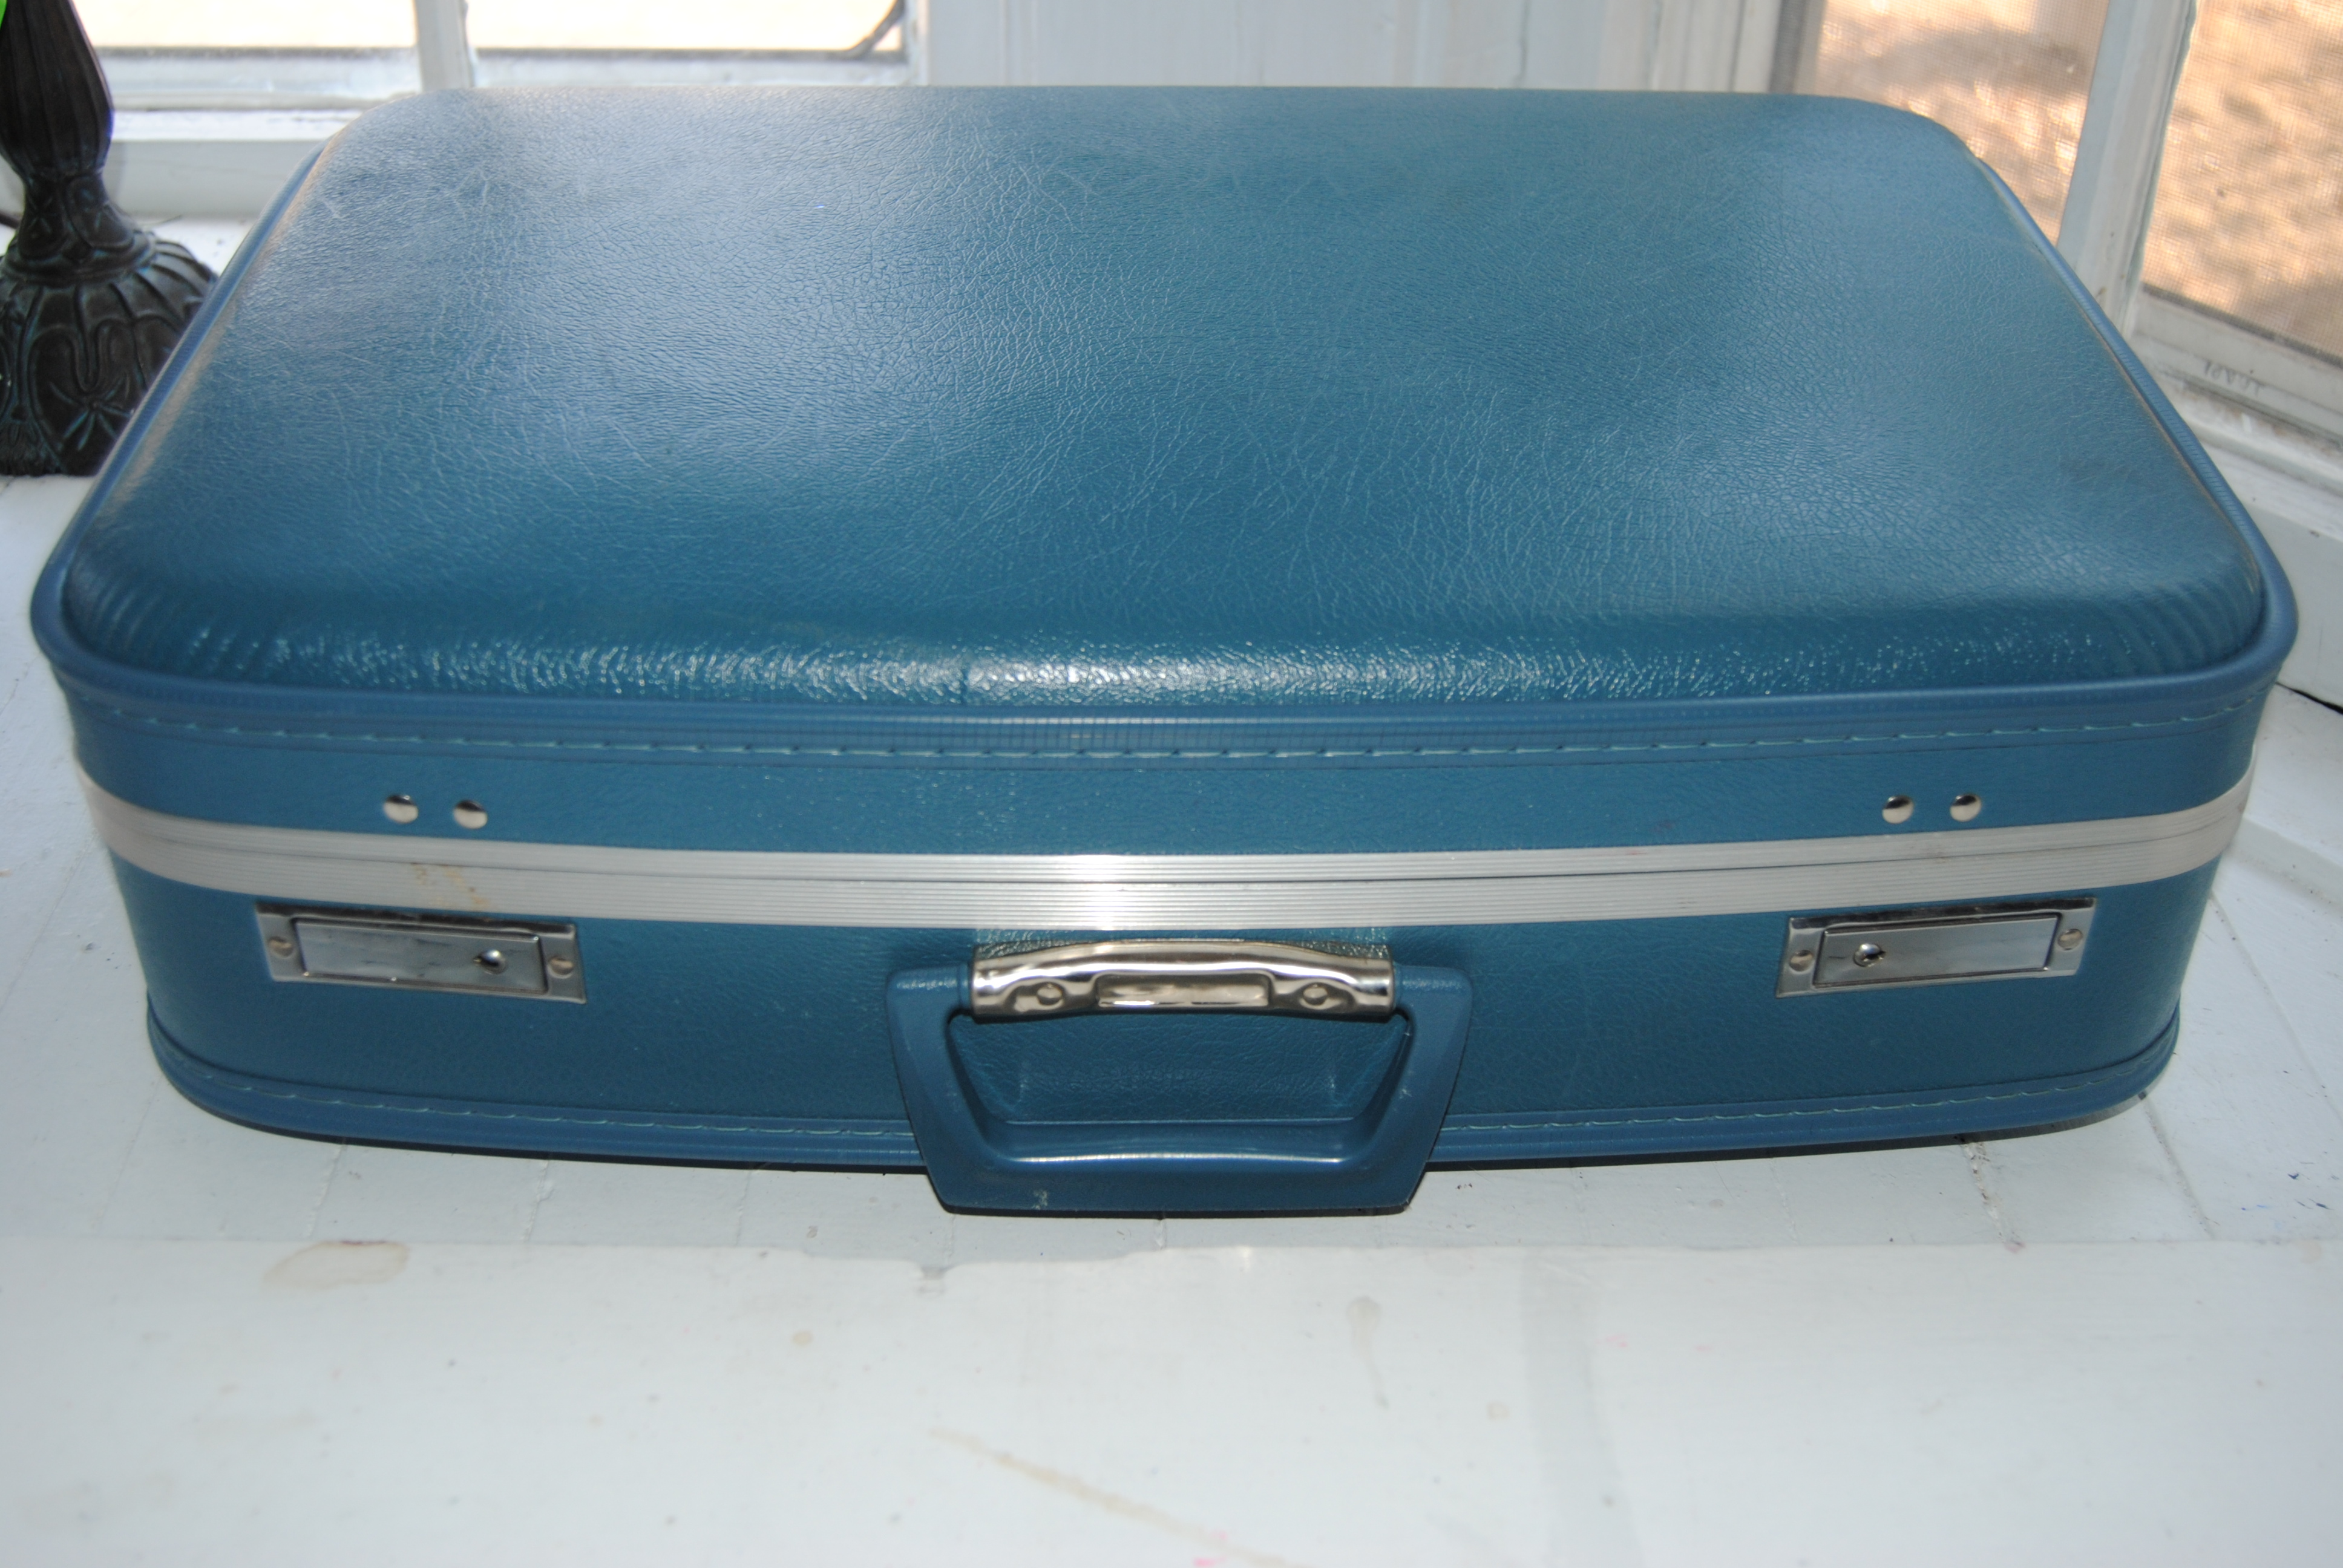 Suitcase Blues chords & lyrics - Triumph - Jellynote